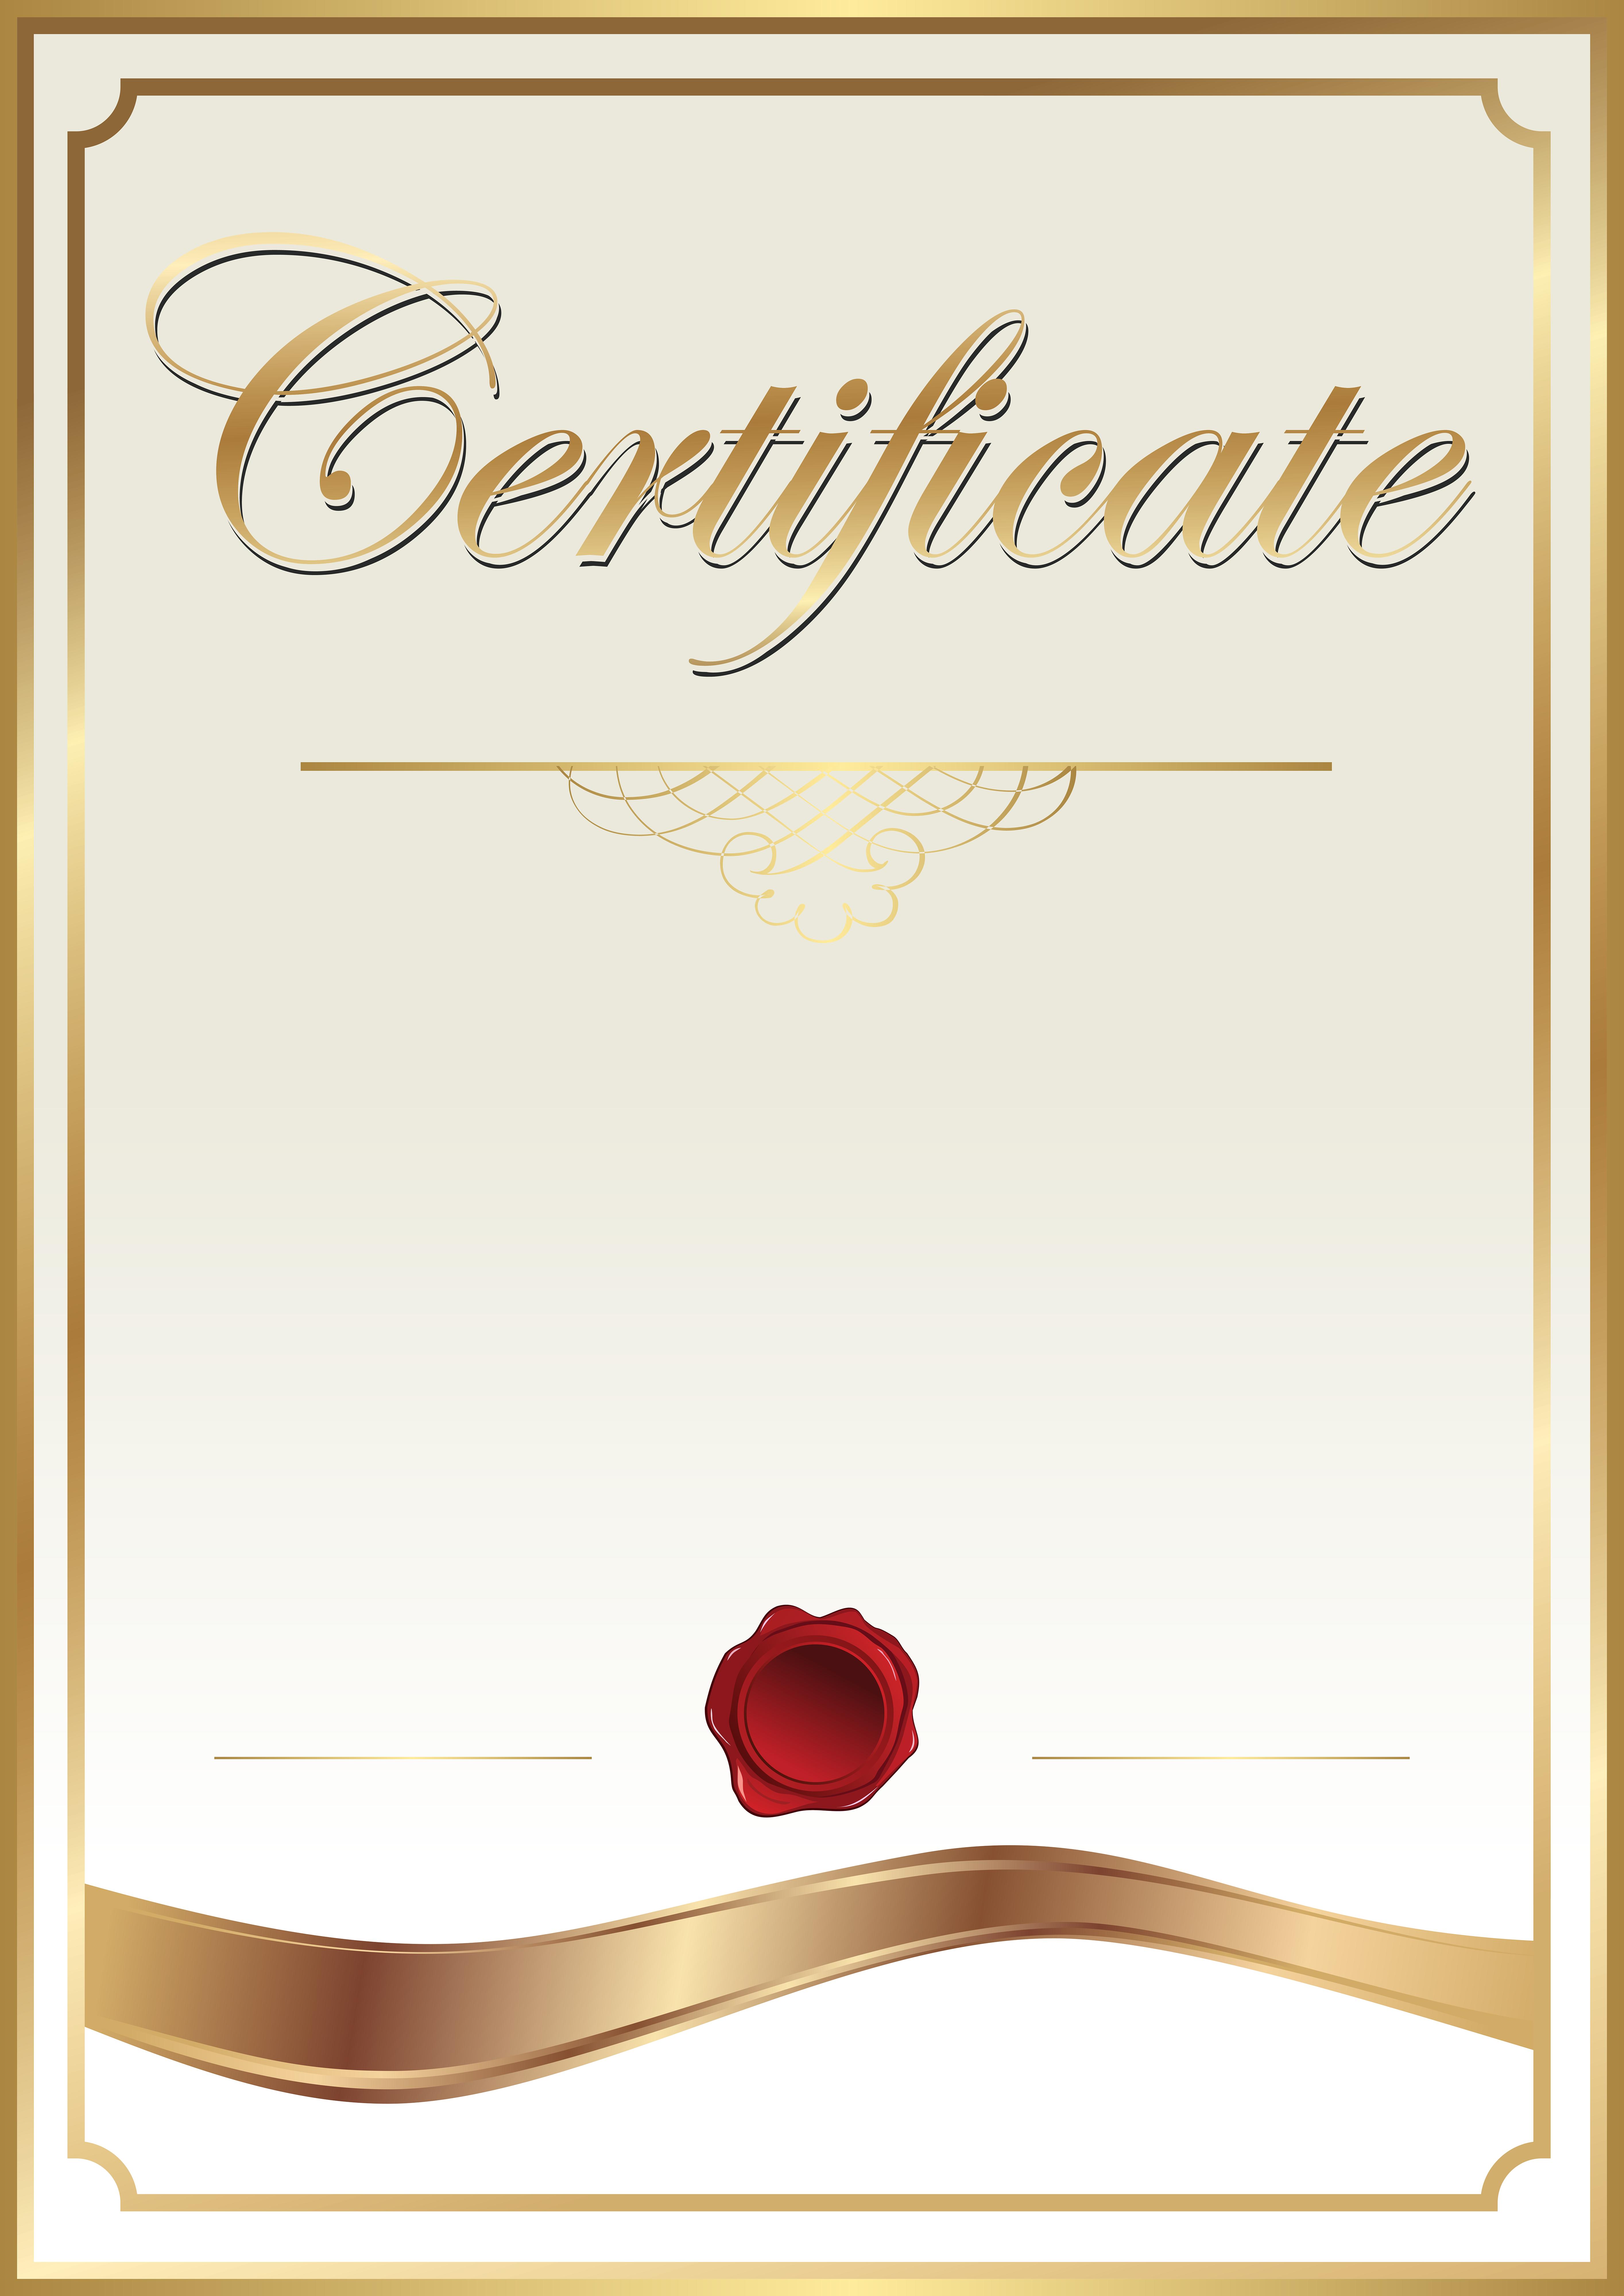 Template clip art png. Certificate clipart